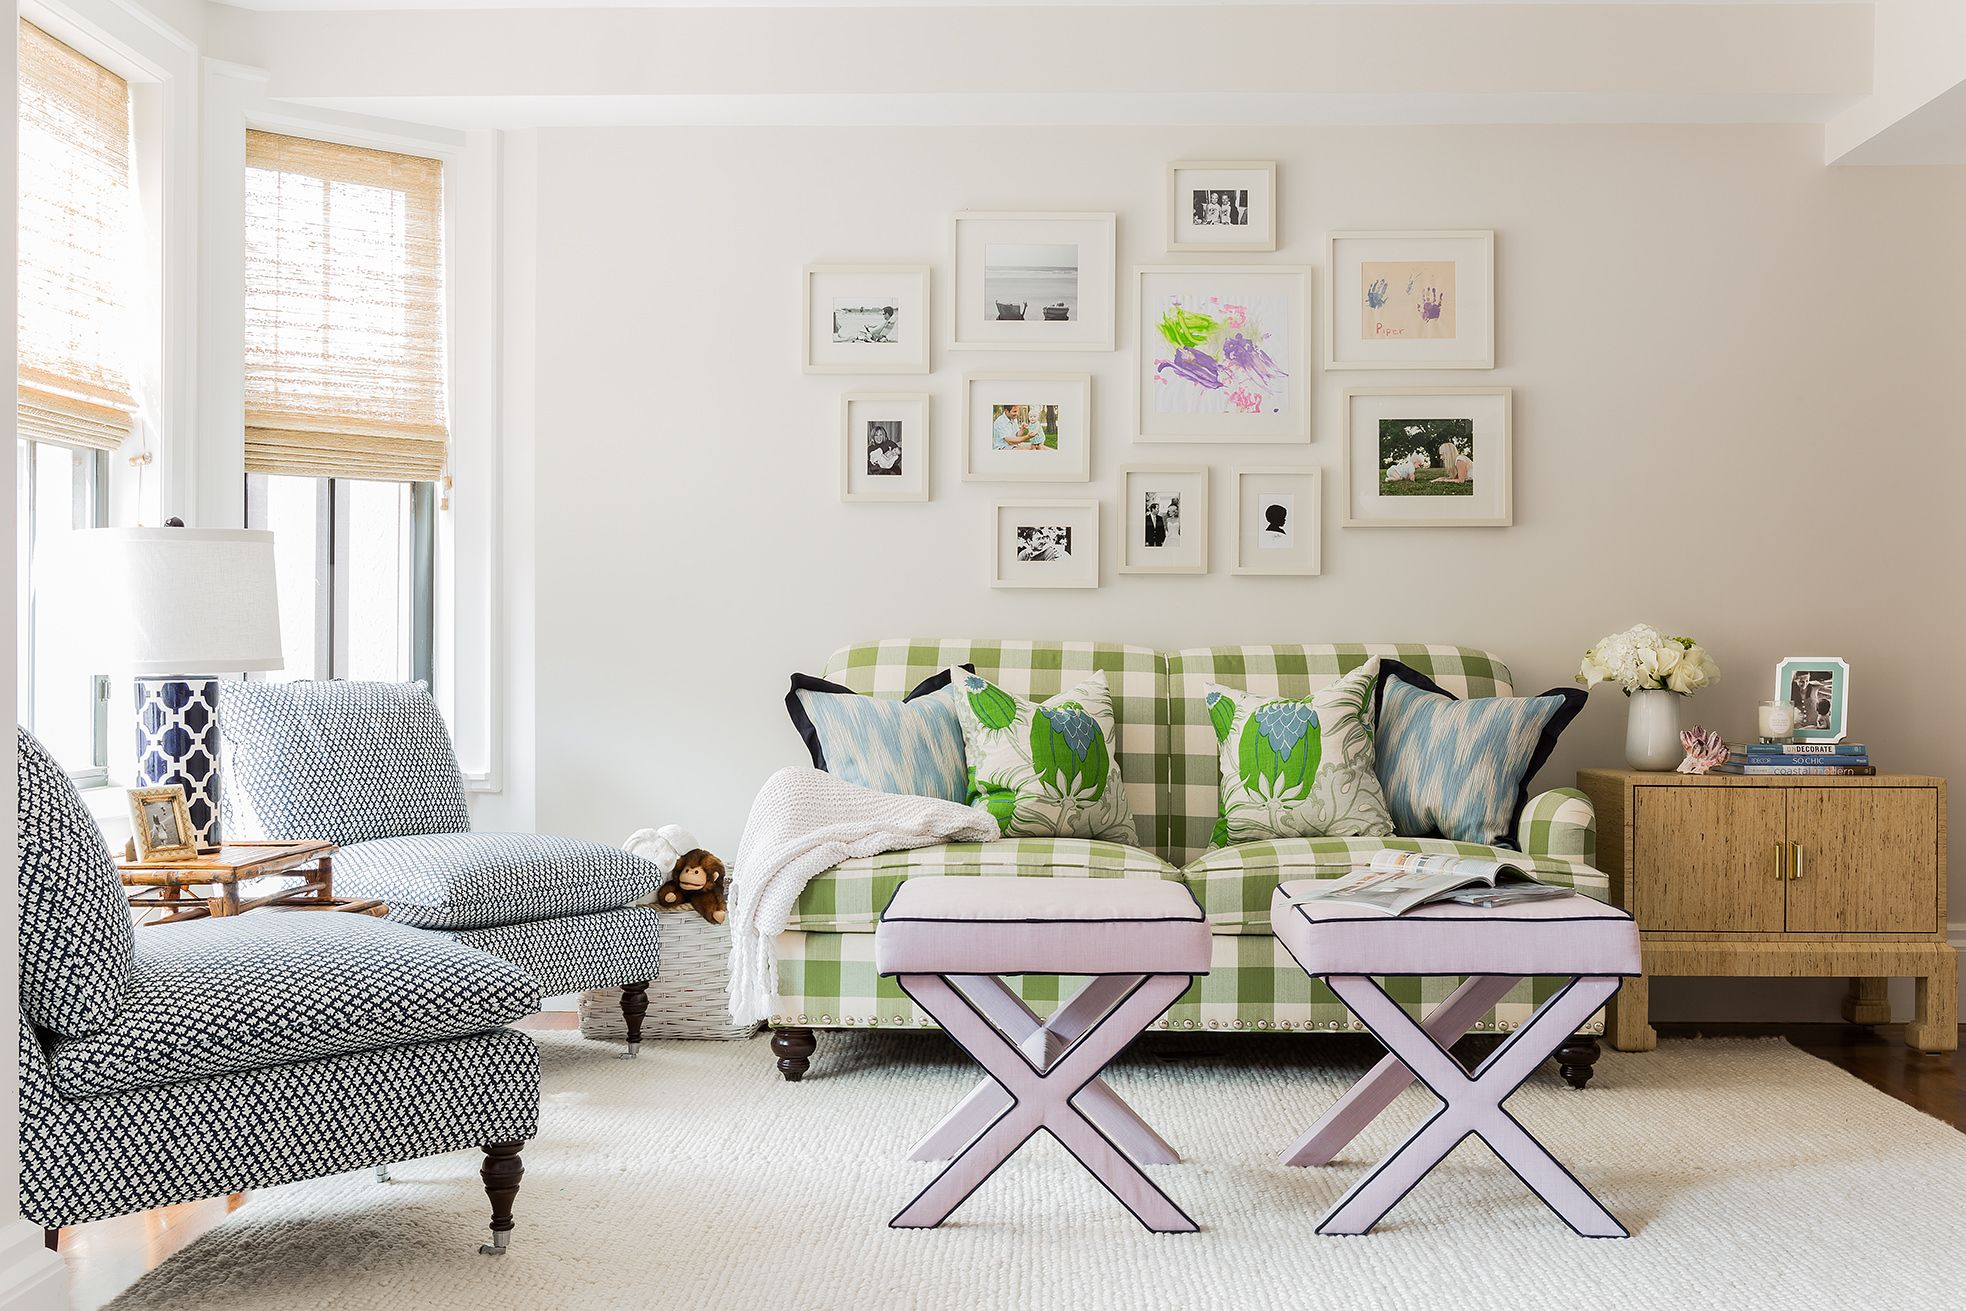 Courtesy of Erin Gates Design & 15 Best Small Living Room Ideas - How to Design a Small Living Room